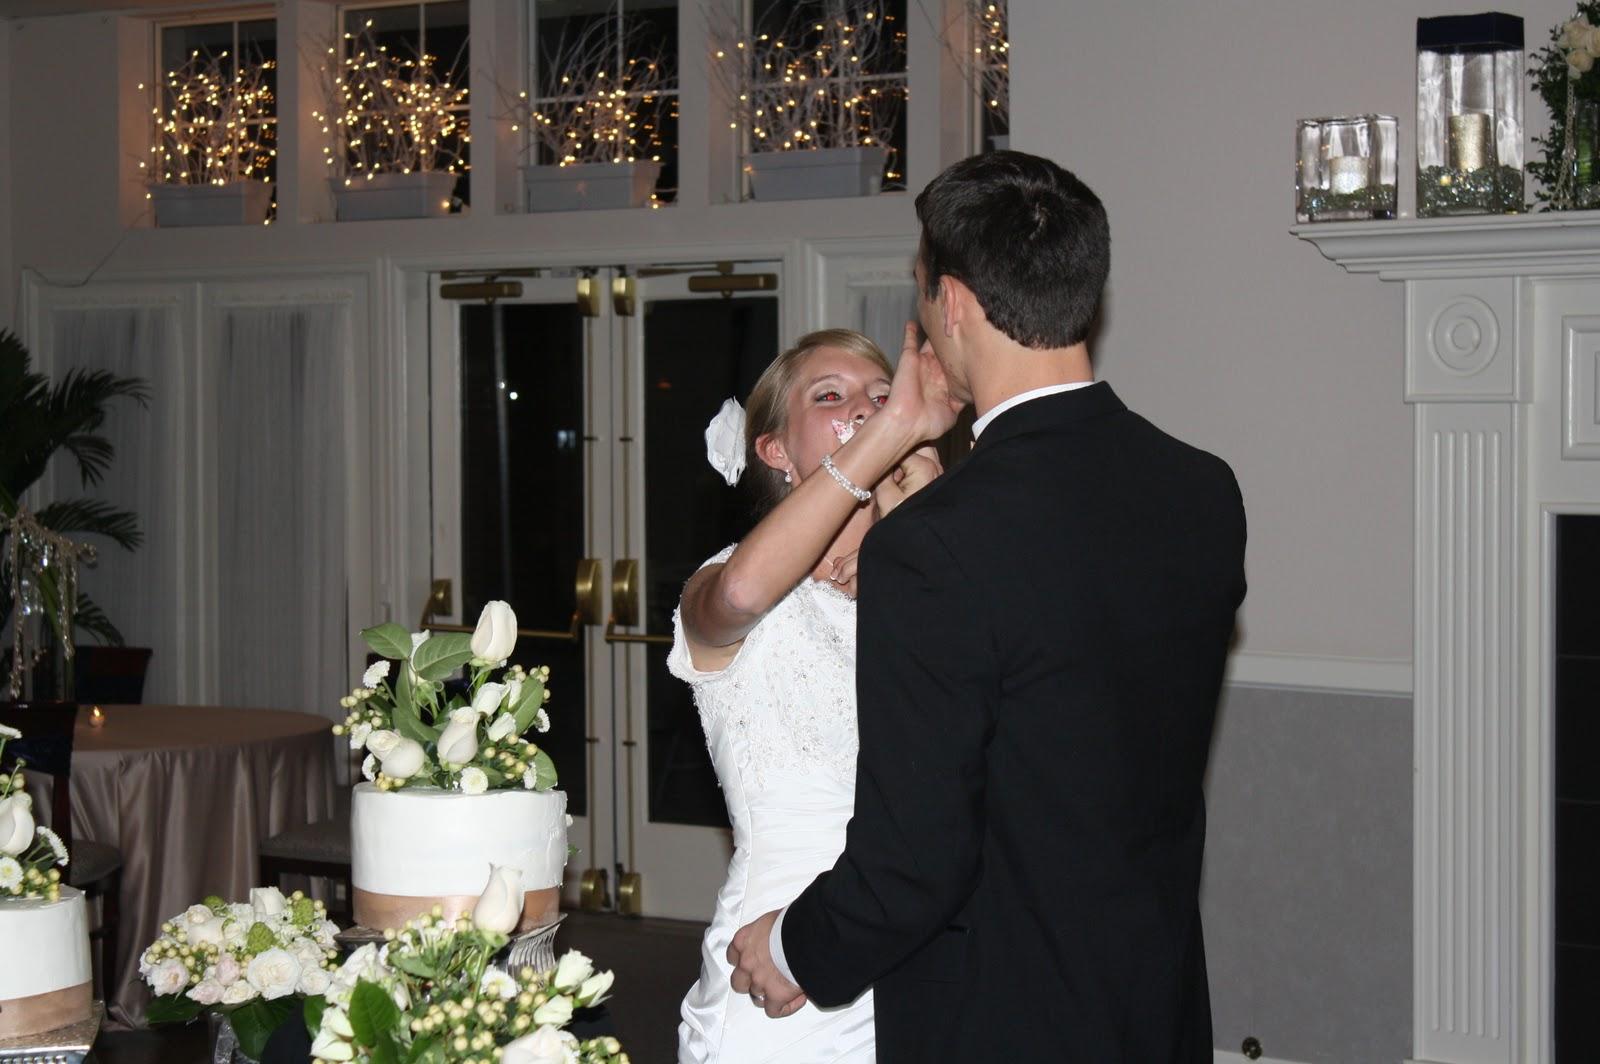 http://4.bp.blogspot.com/_gzRc9Myo0yU/TRlLPK1z9sI/AAAAAAAA_Ps/r4JEIntlWmc/s1600/Martin+Wedding+635.JPG